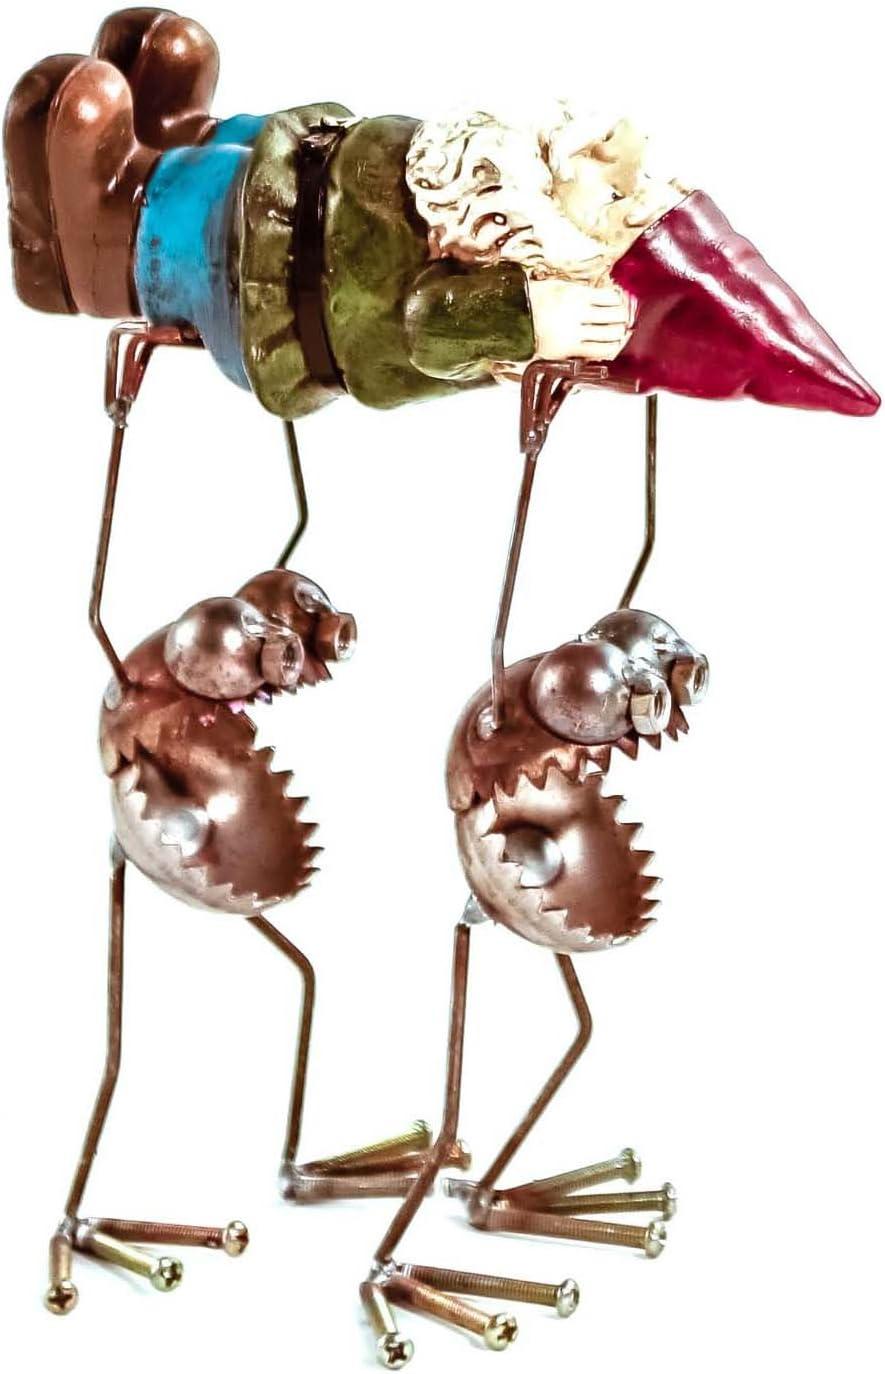 Sugarpost Scrap Metal Gnome Be Gone- Gnome Bearers With Gnome Indoor Outdoor Metal Art Sculptures